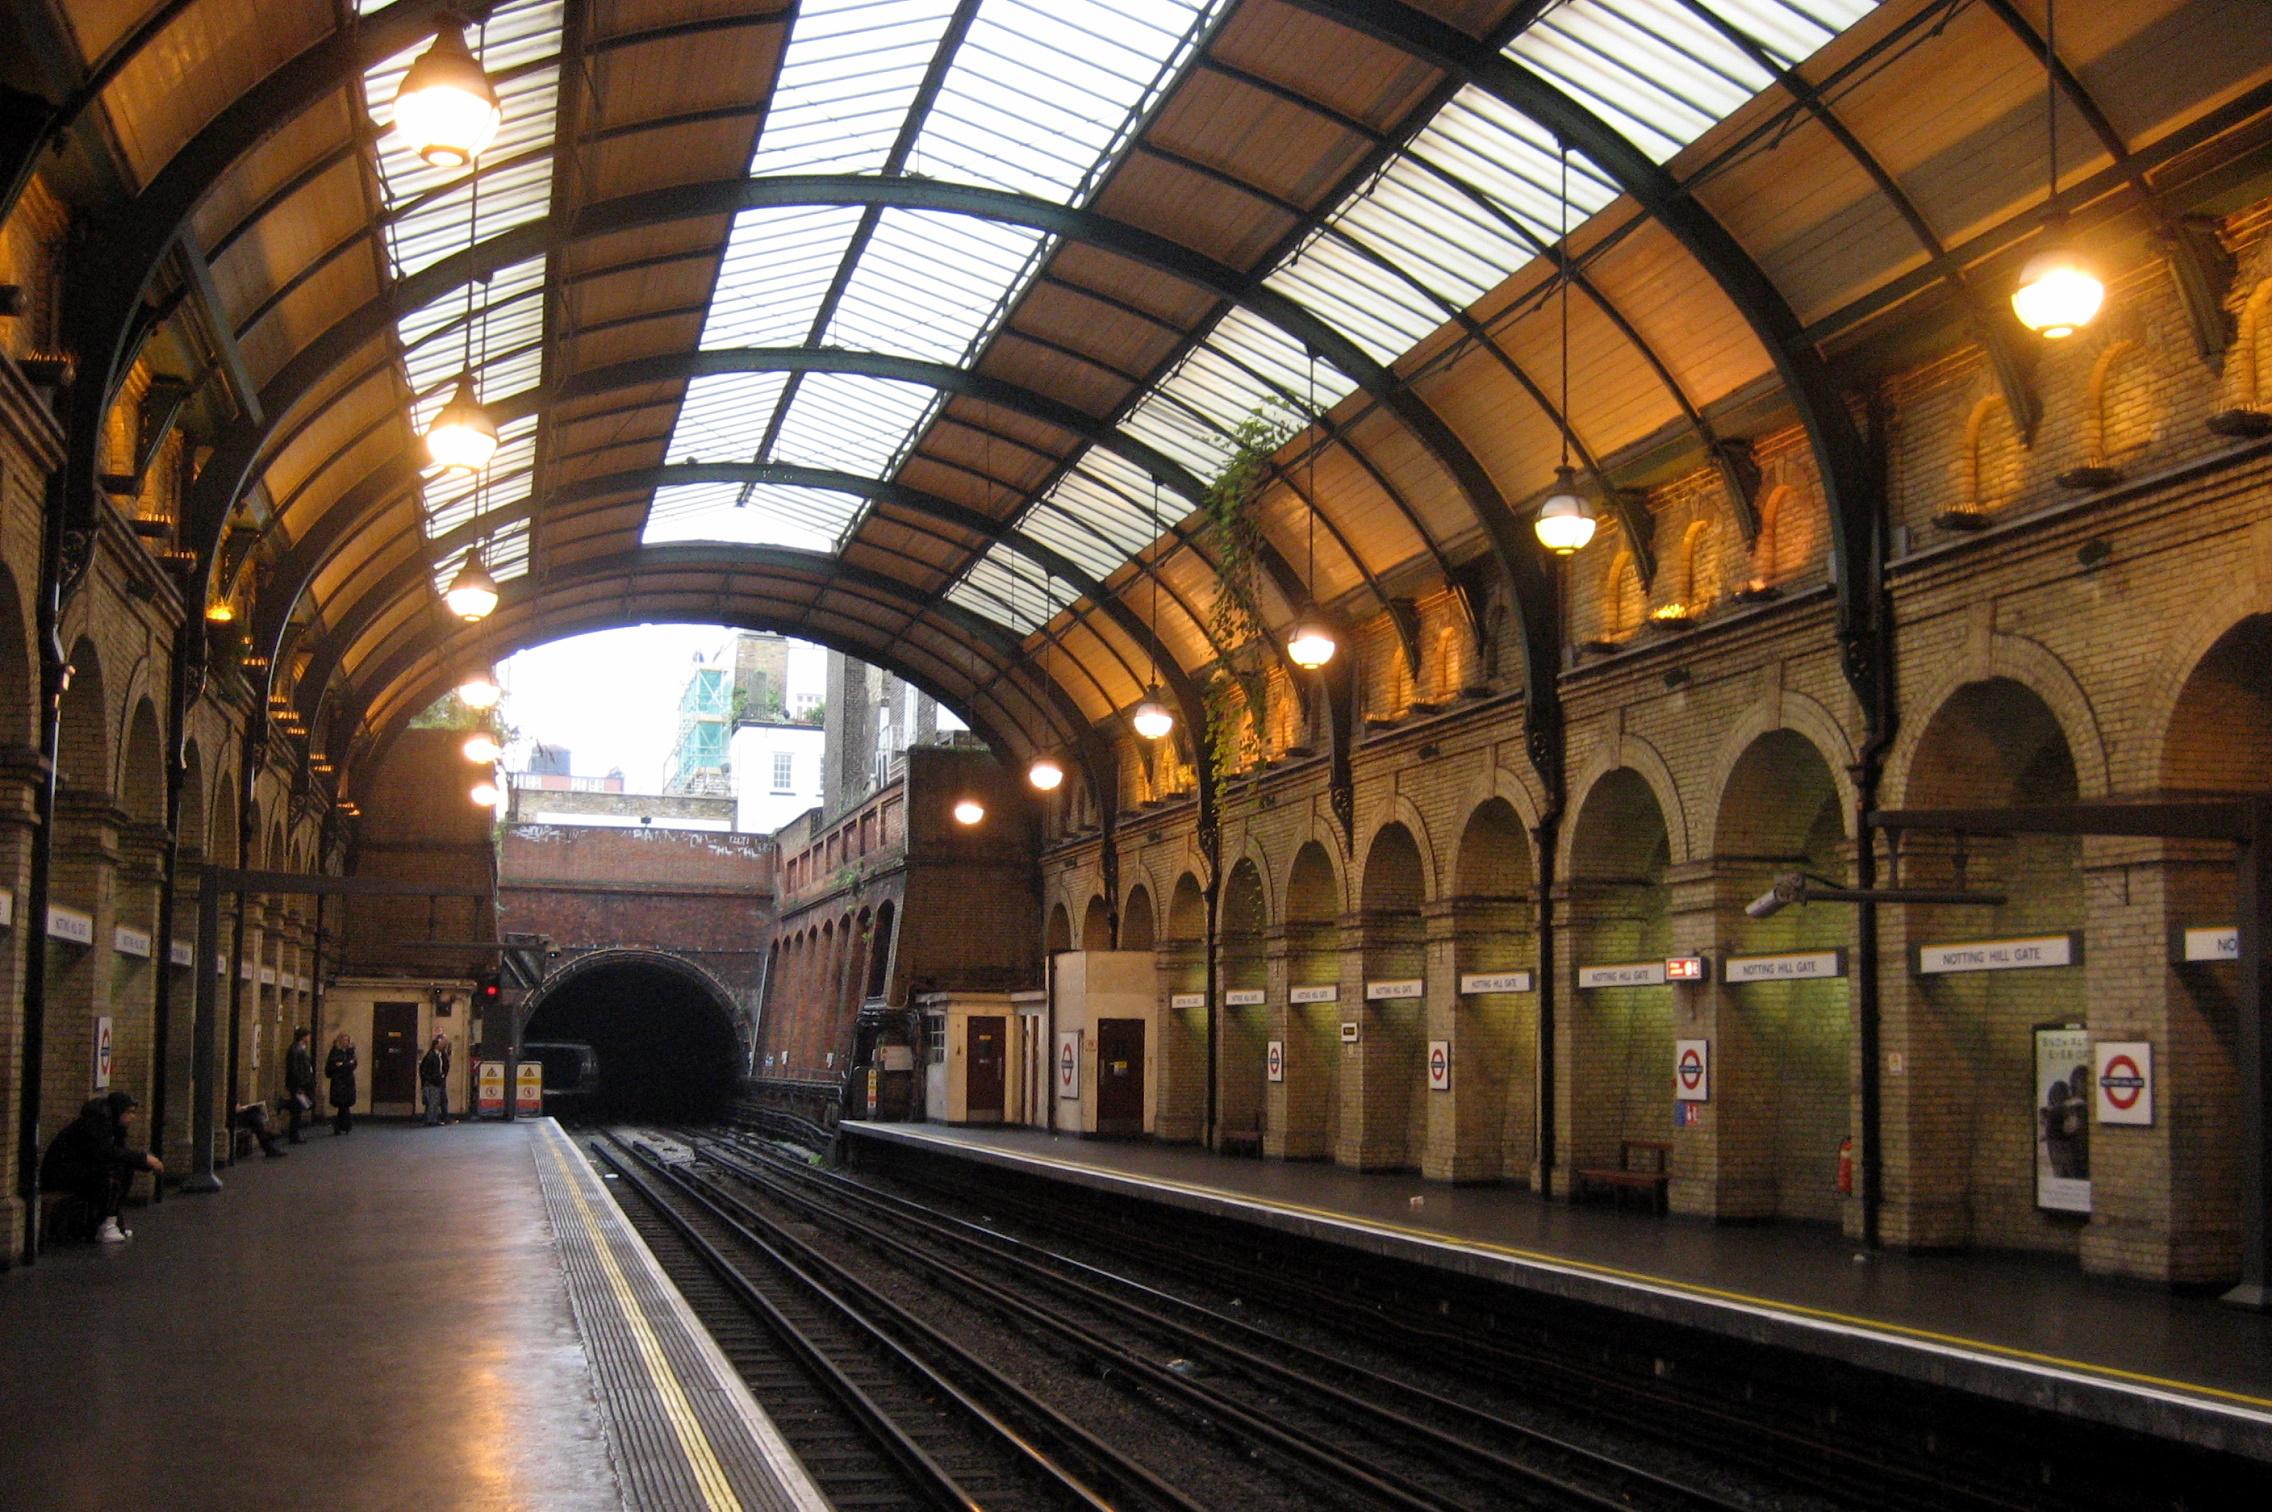 UK - London: Notting Hill Gate Station | Notting Hill Gate ... London Underground Stations